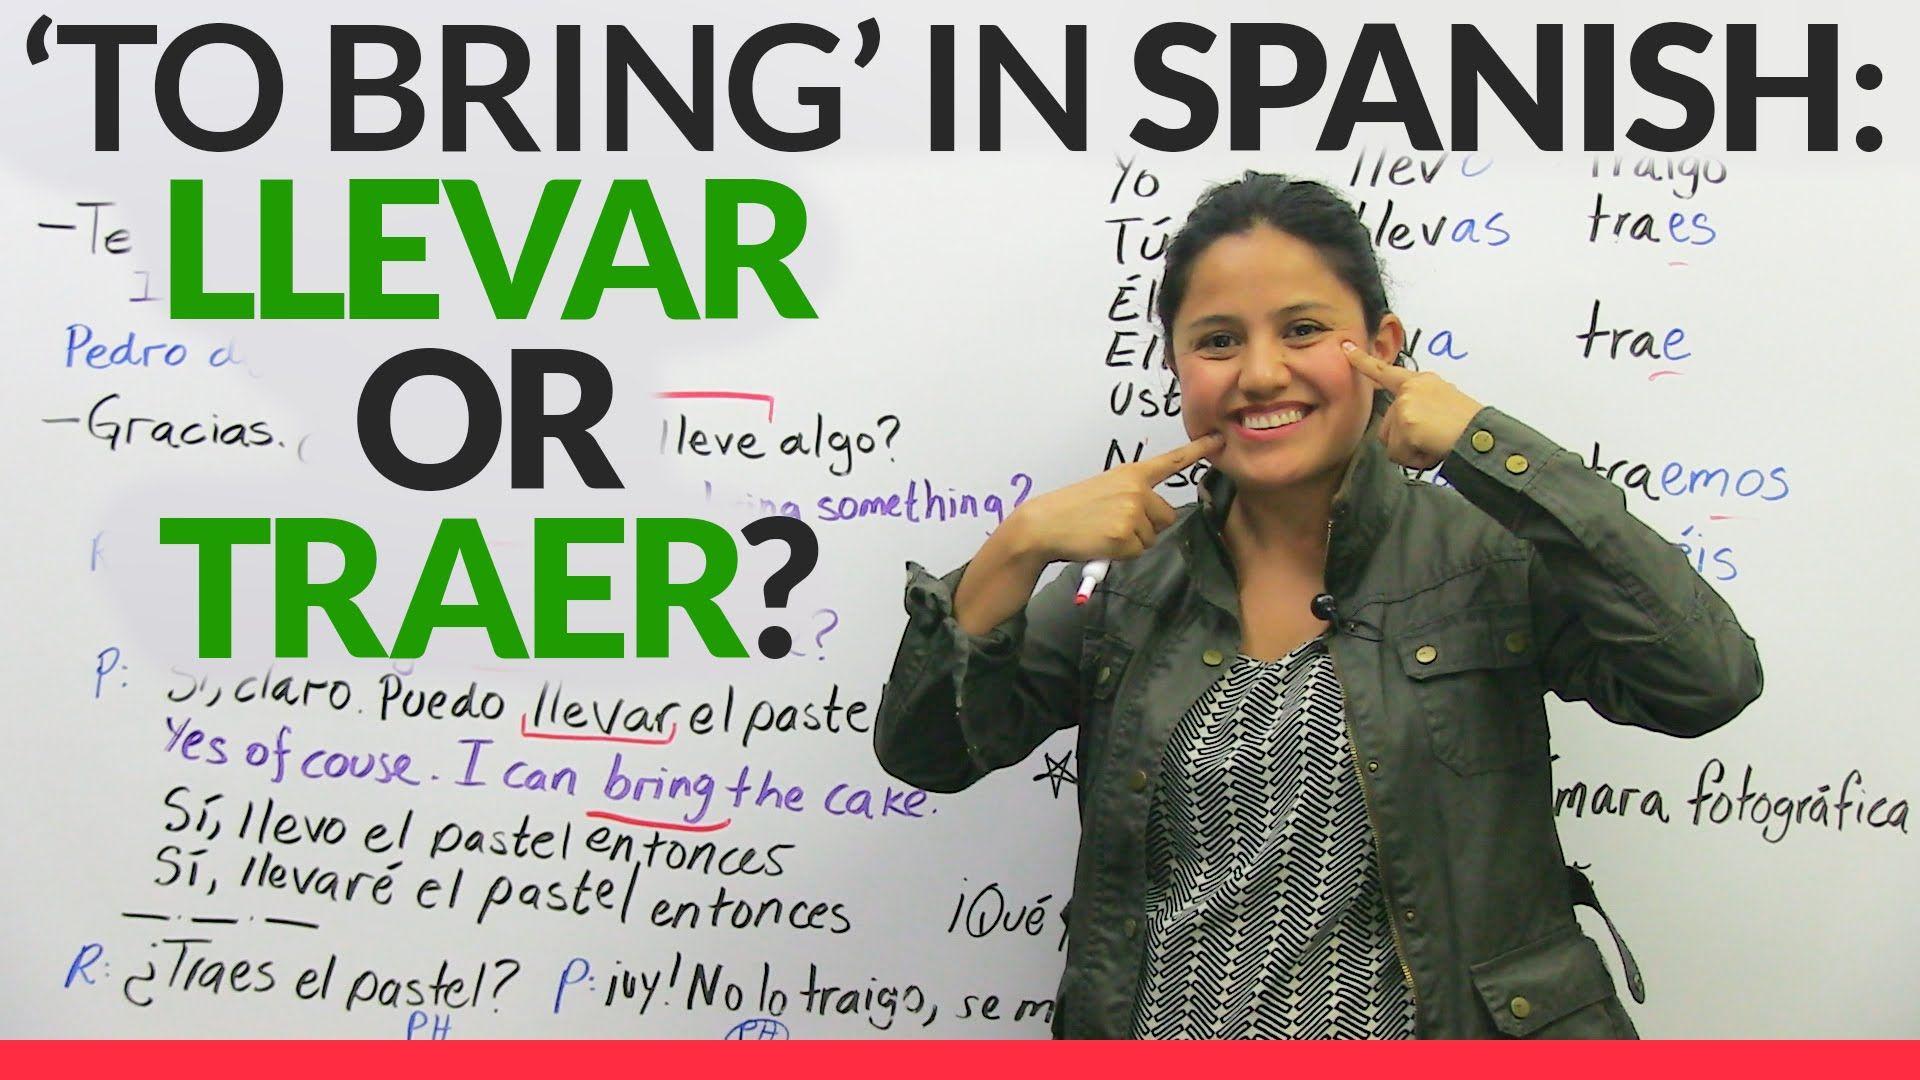 To Bring In Spanish Llevar Or Traer